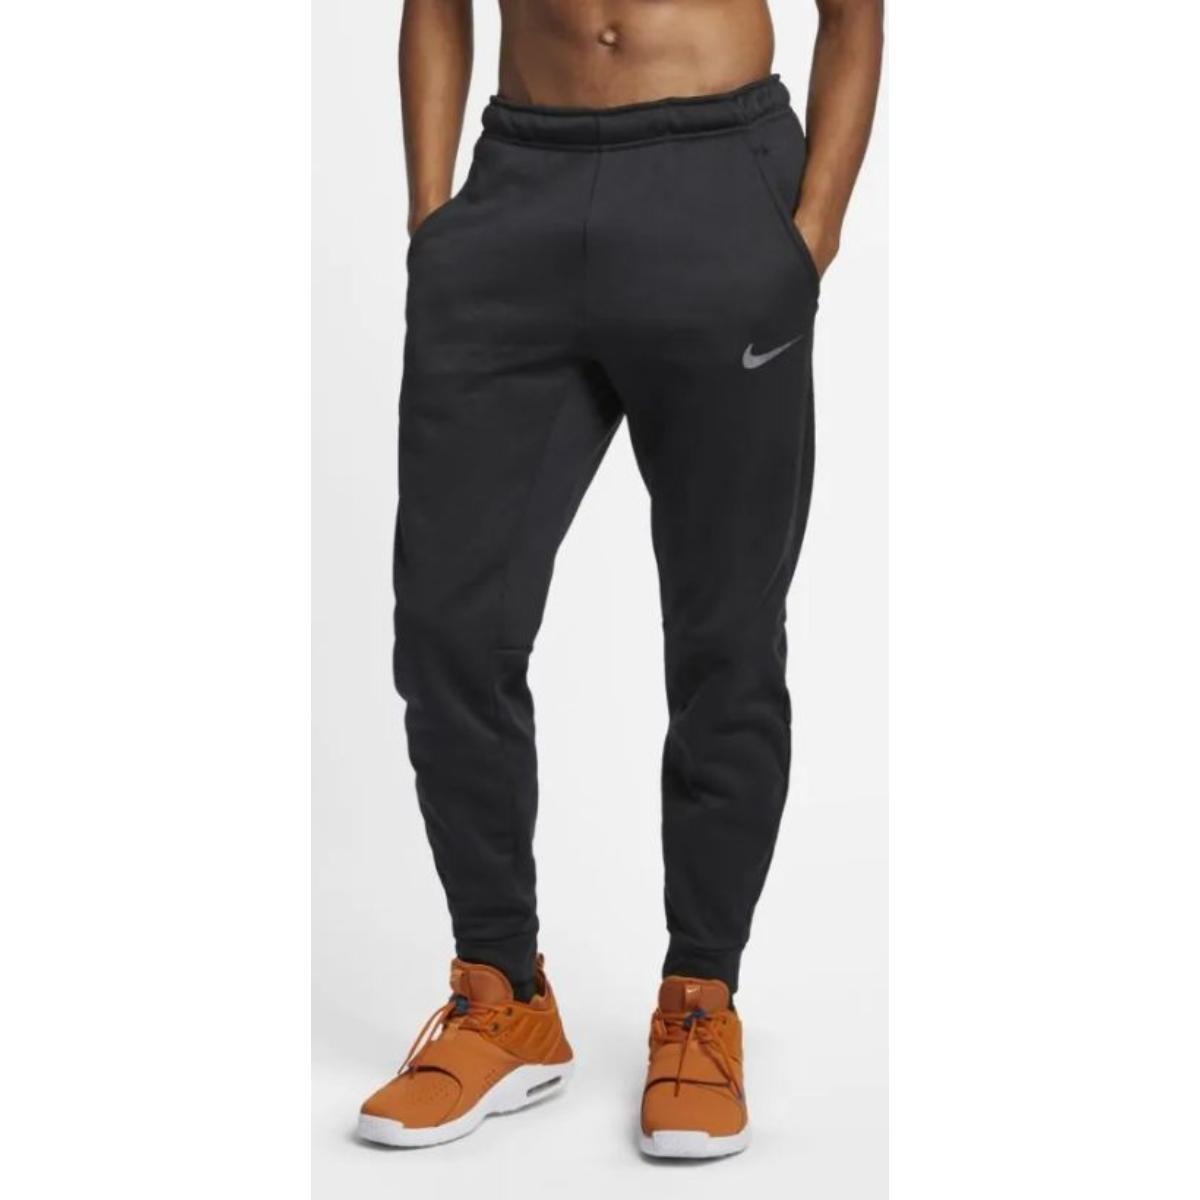 Calça Masculina Nike 932255-010 Therma Preto